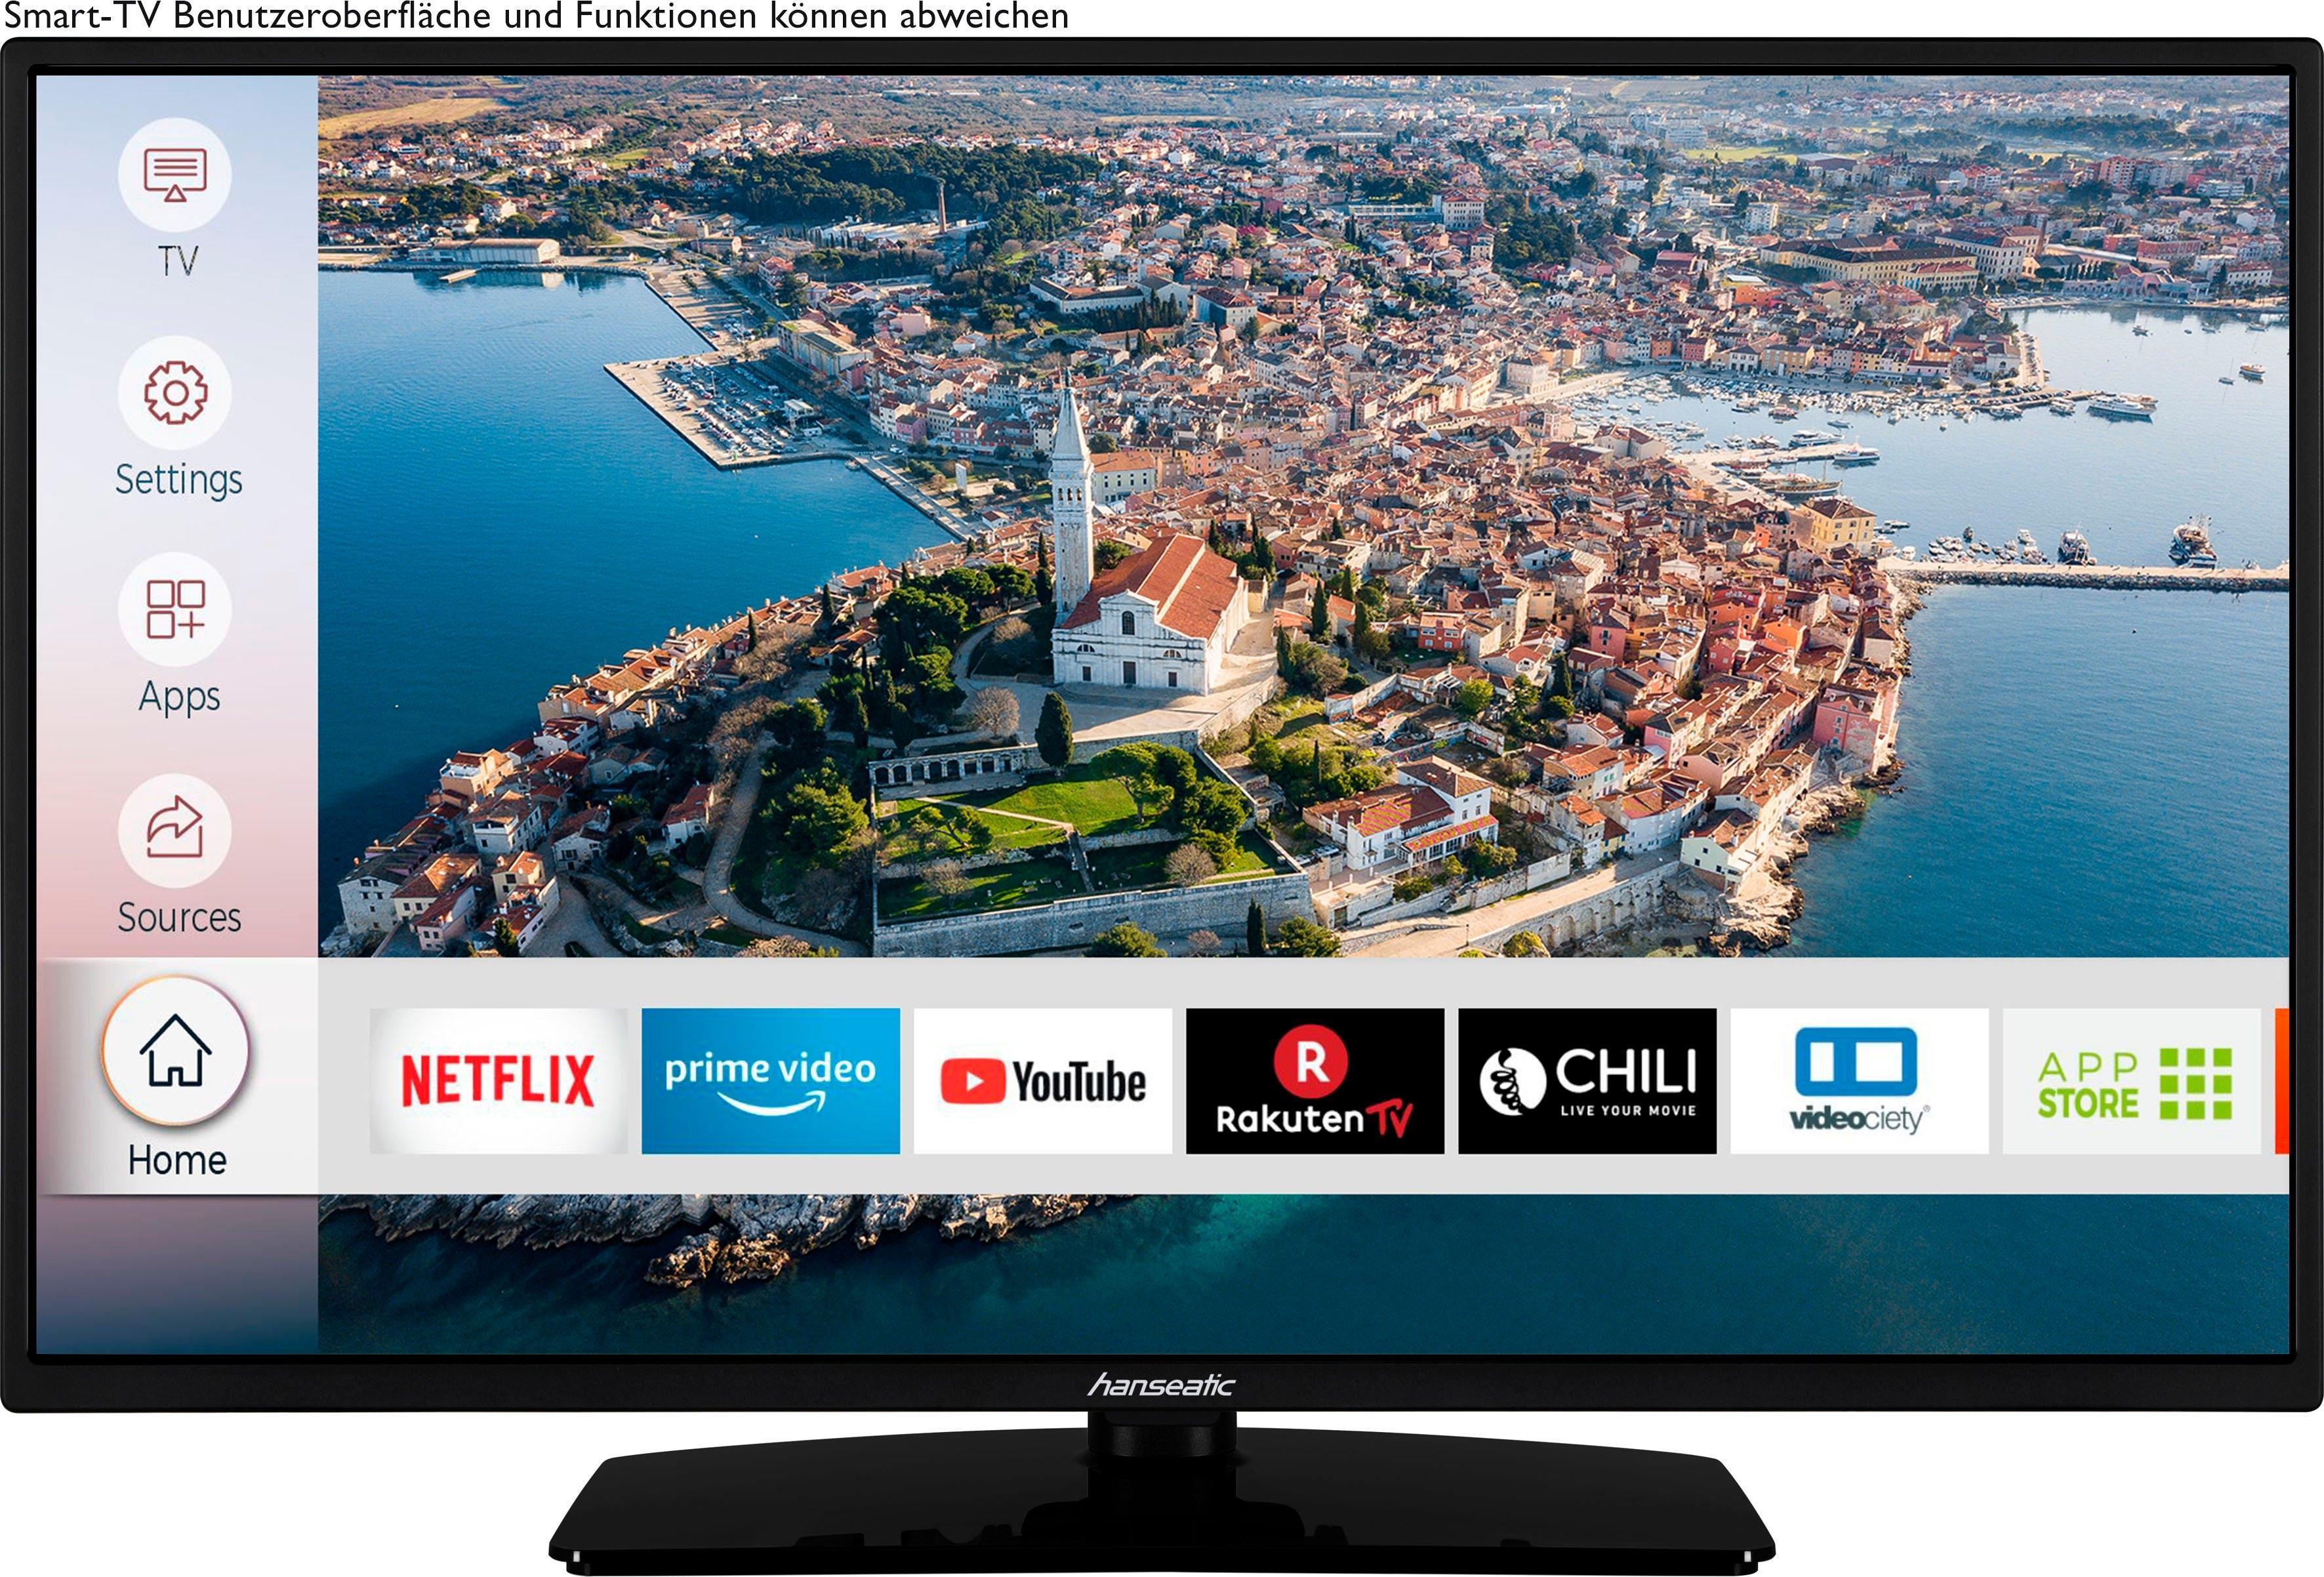 Hanseatic LED-TV 32H500FDSII, 80 cm / 32